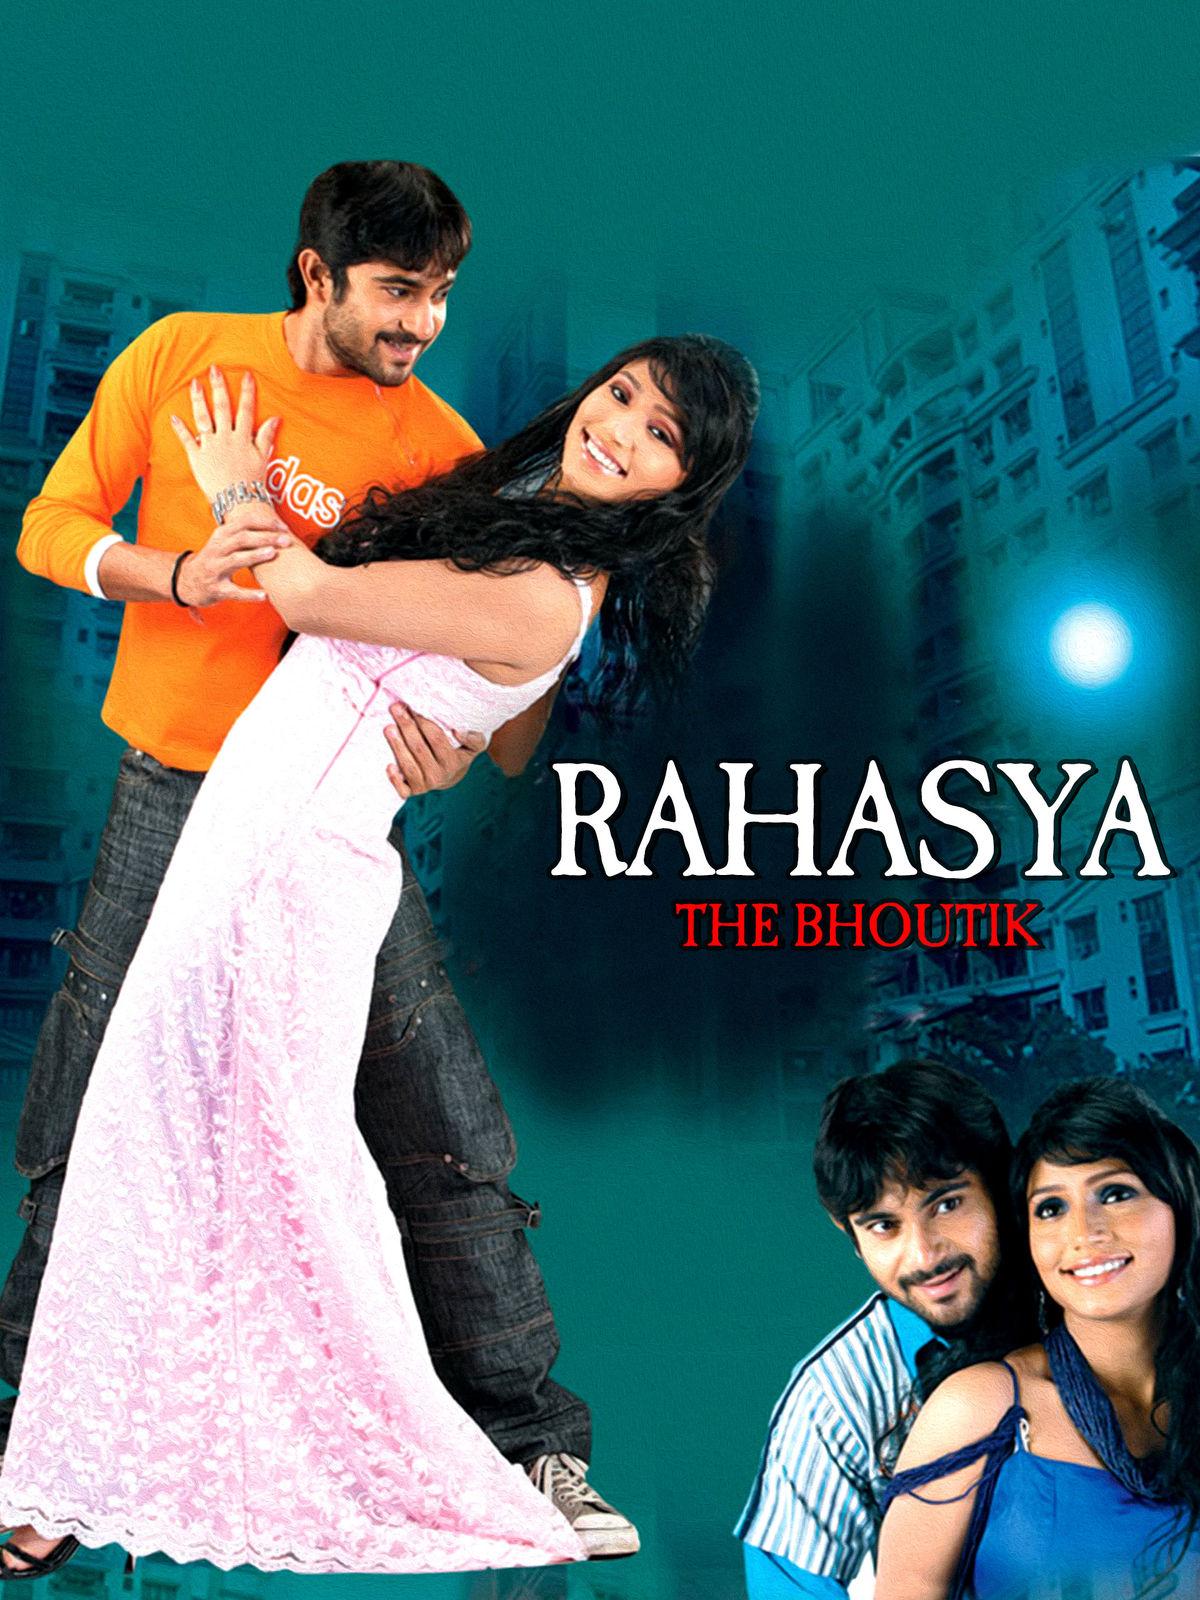 Rahasya The Bhoutik